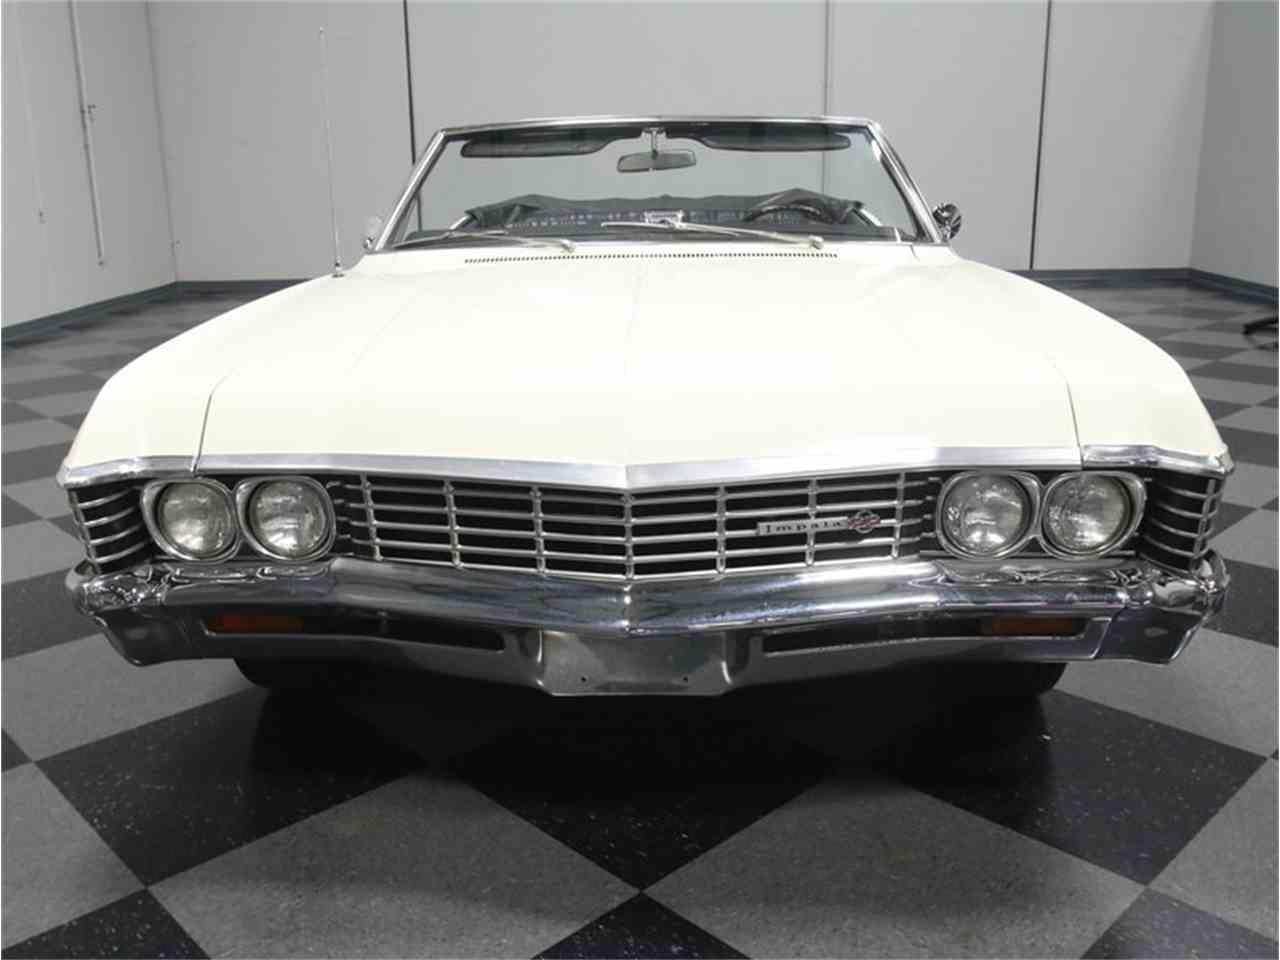 Impala 1967 black chevrolet impala : 1967 Chevrolet Impala SS for Sale | ClassicCars.com | CC-983333